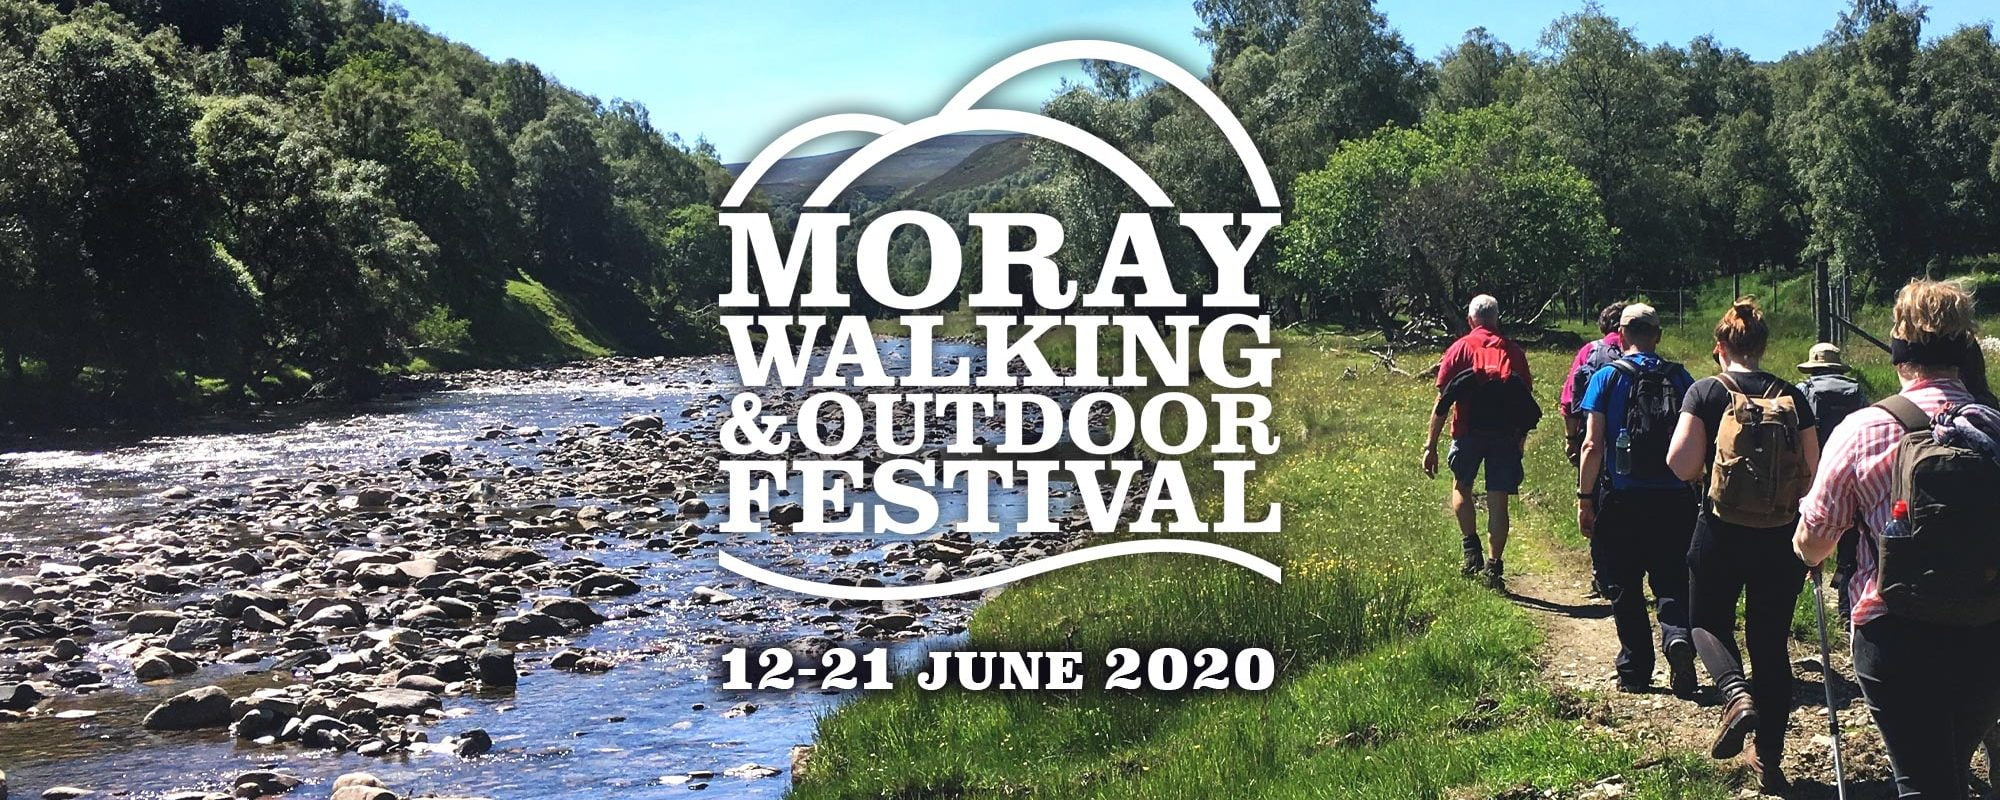 Moray Walking & Outdoor Festival 12-21 June 2020